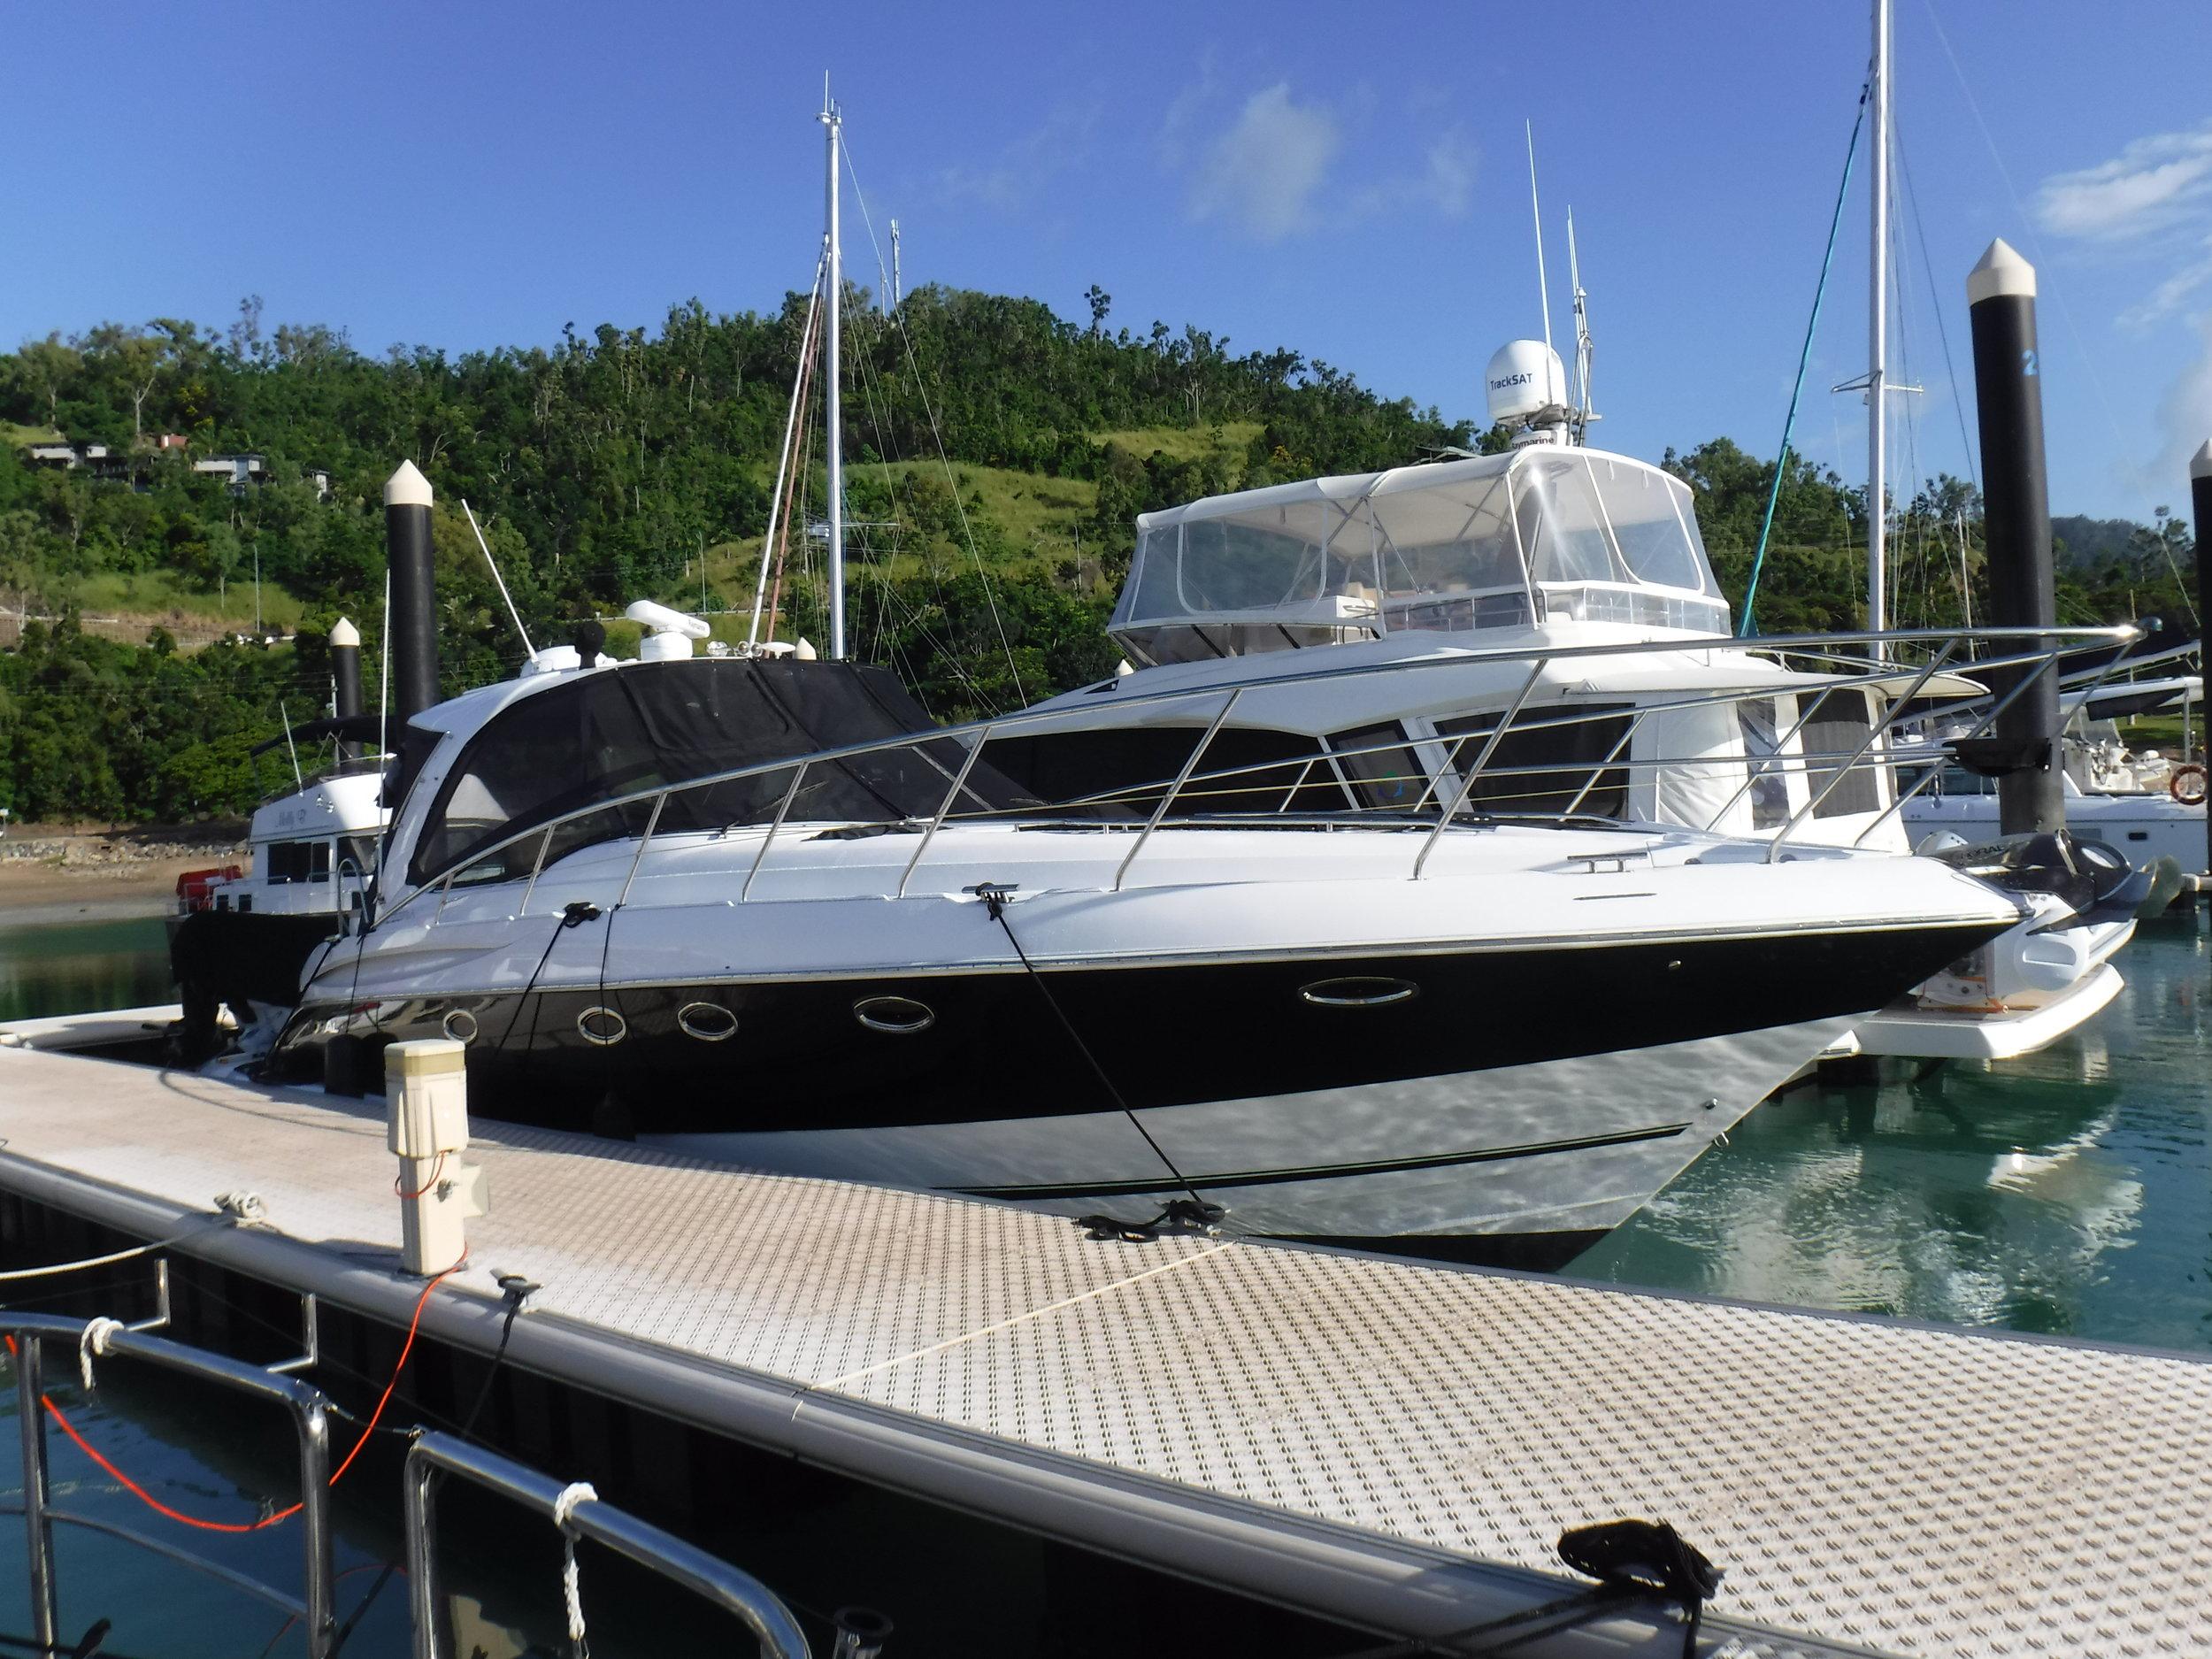 bonefish and new boats 358.JPG